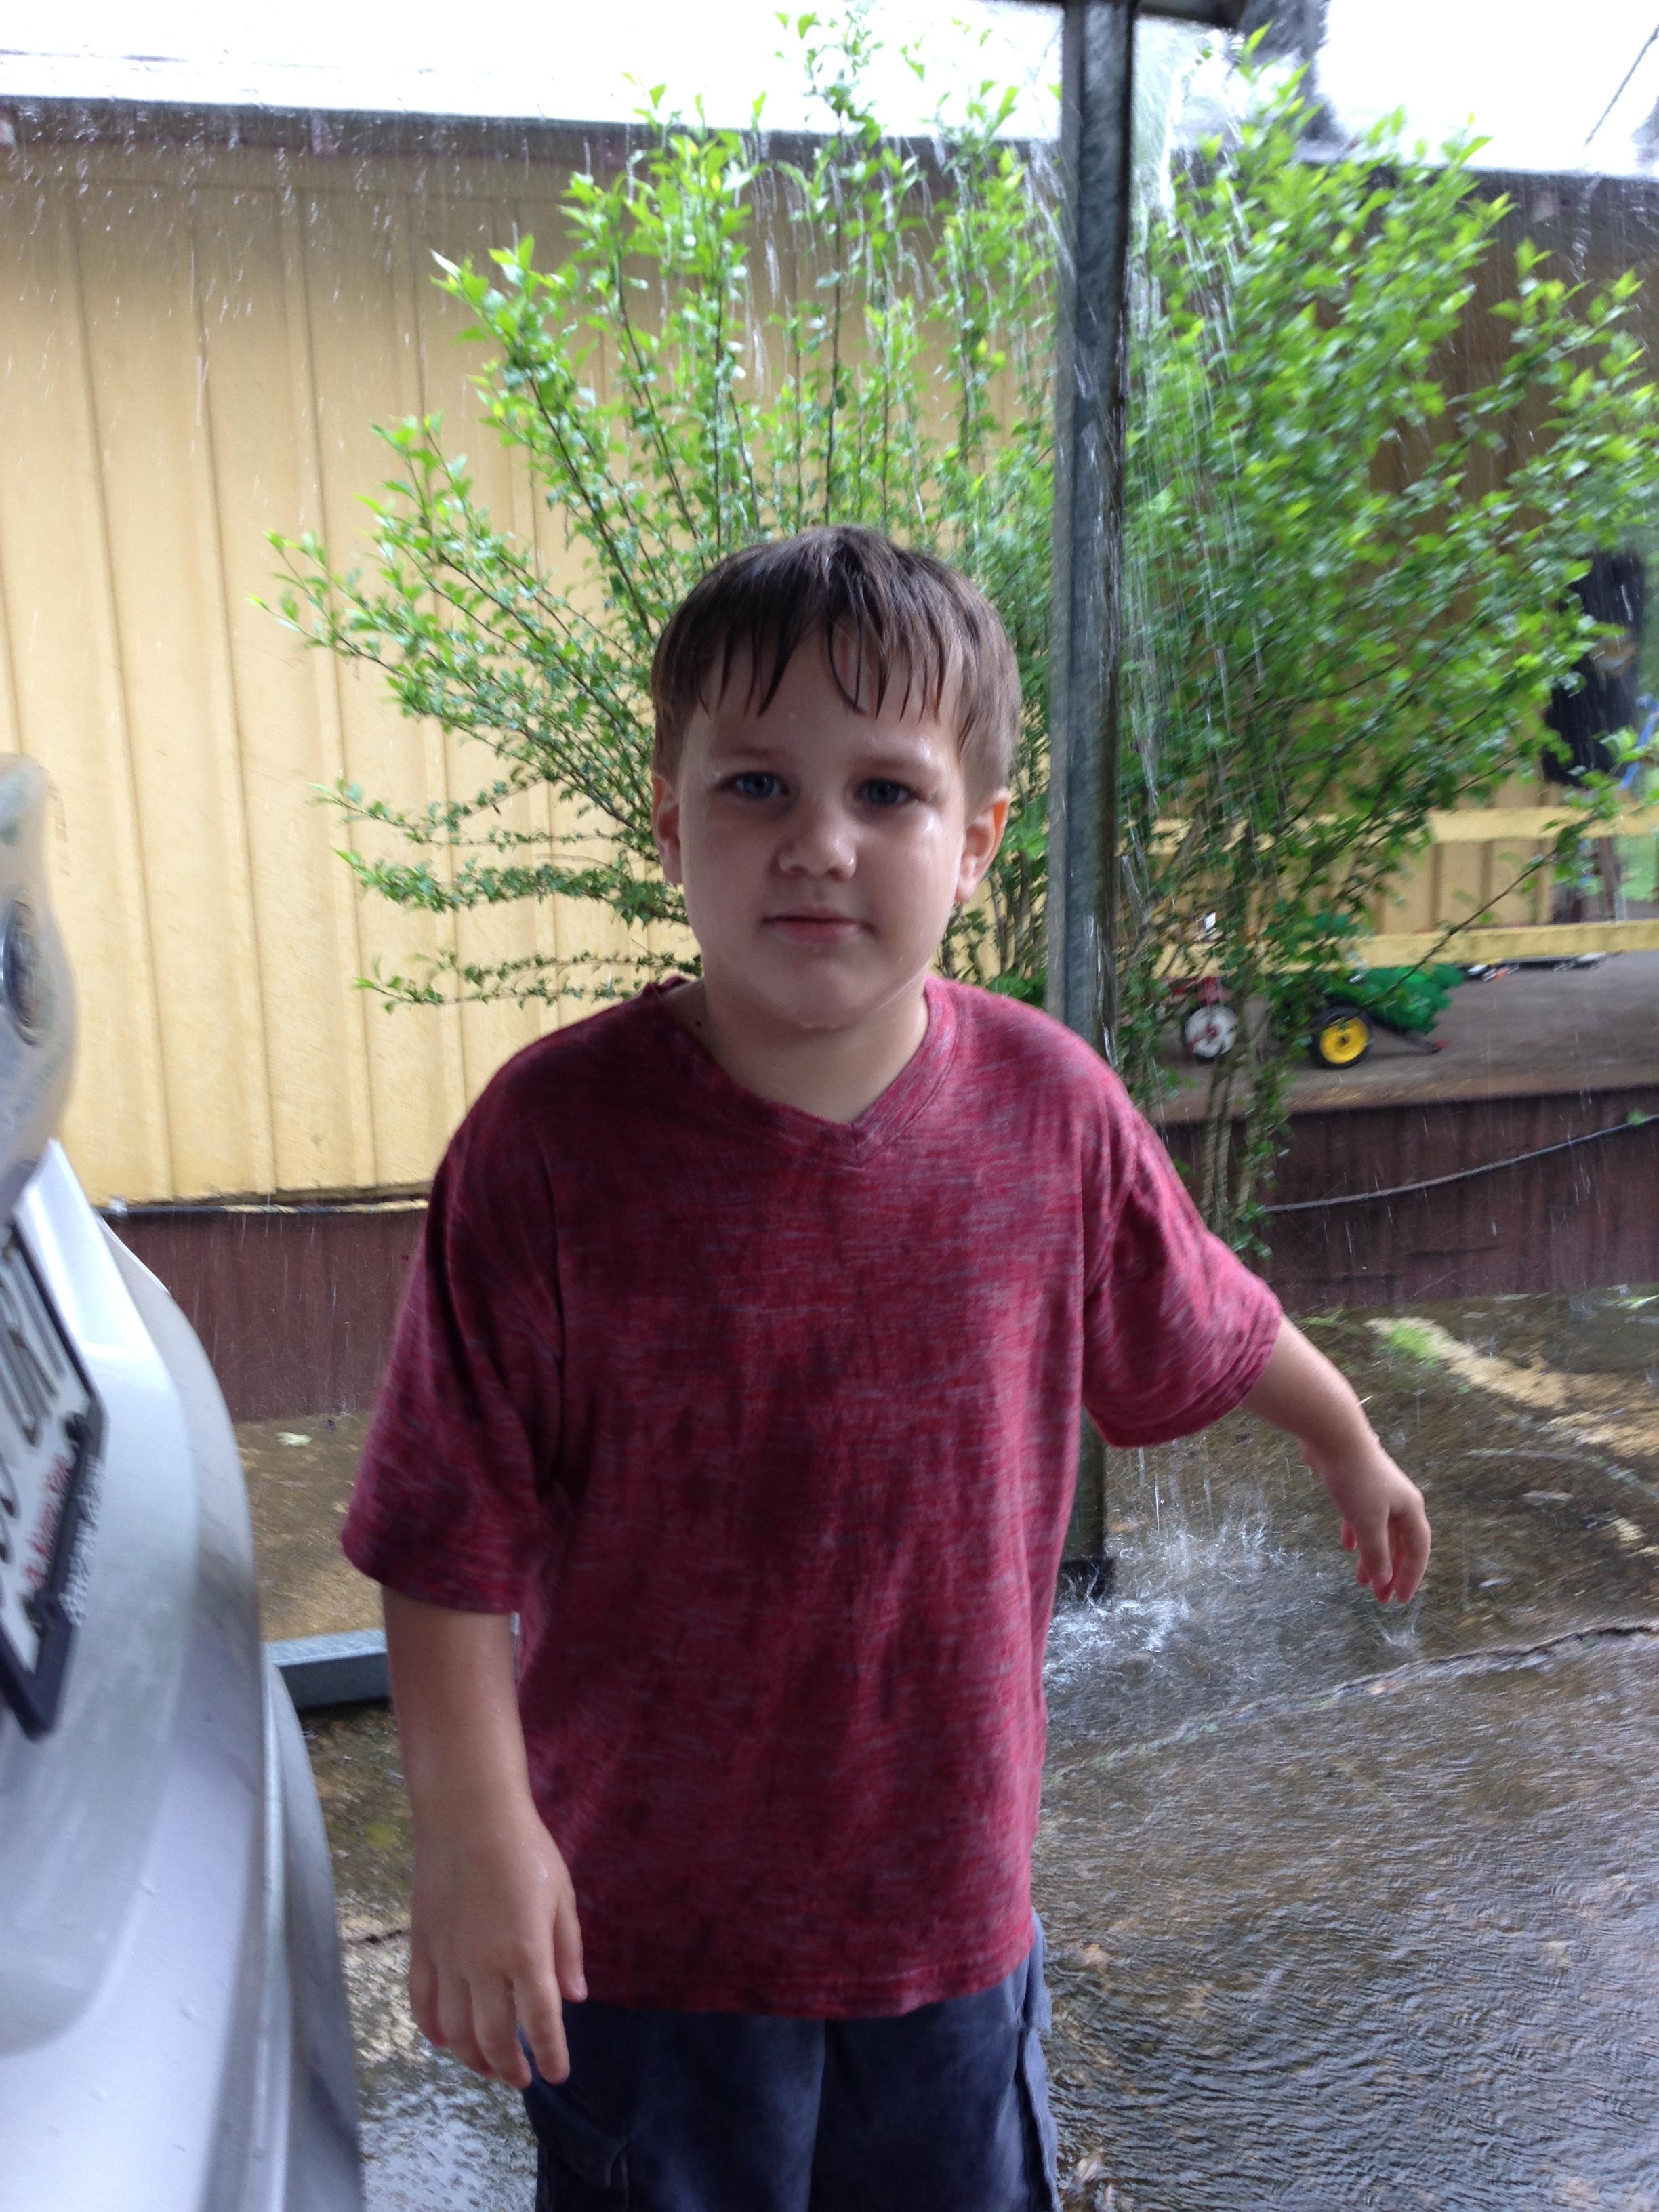 My cousin Michael's grandson, Bentley got a little wet in the downpour!